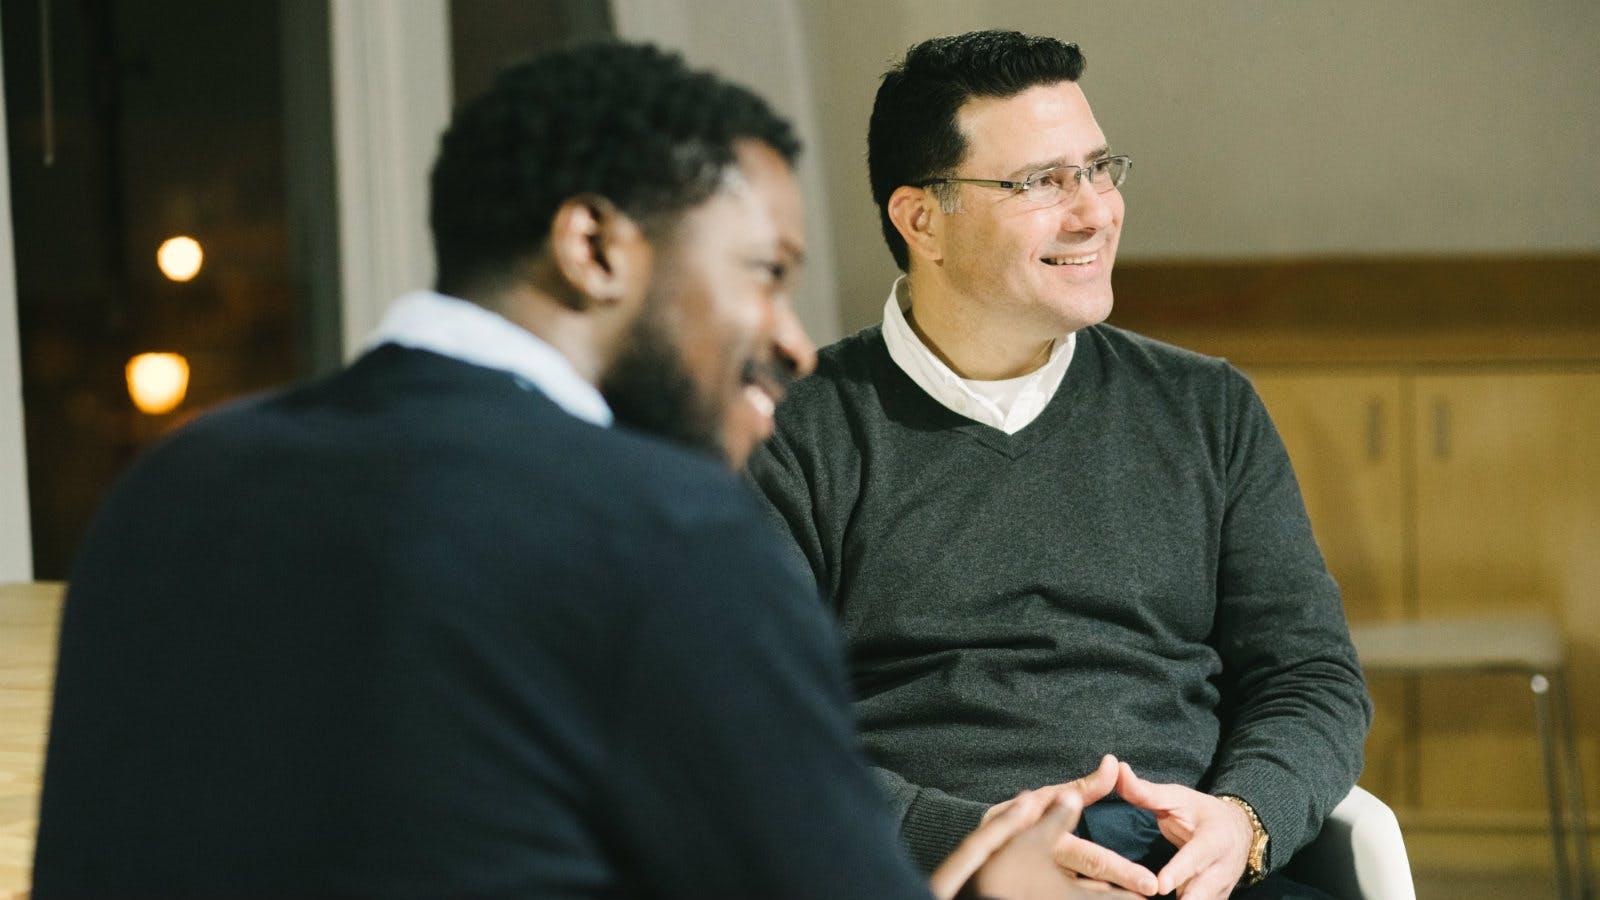 Pastors Lead by Example | Desiring God